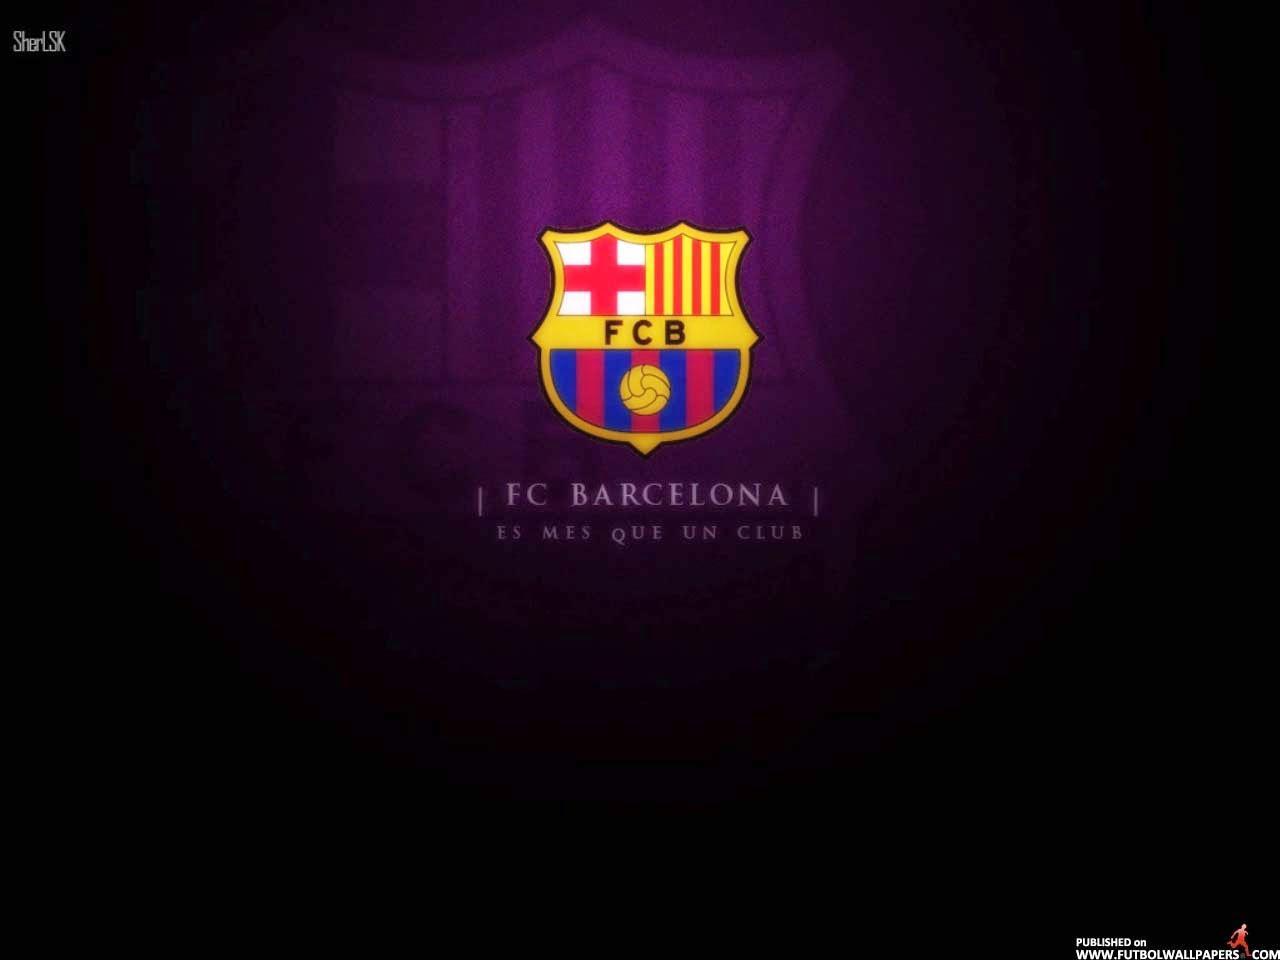 Mesut Ozil Wallpapers Hd Arsenal Download Barcelona Wallpapers Hd Wallpaper